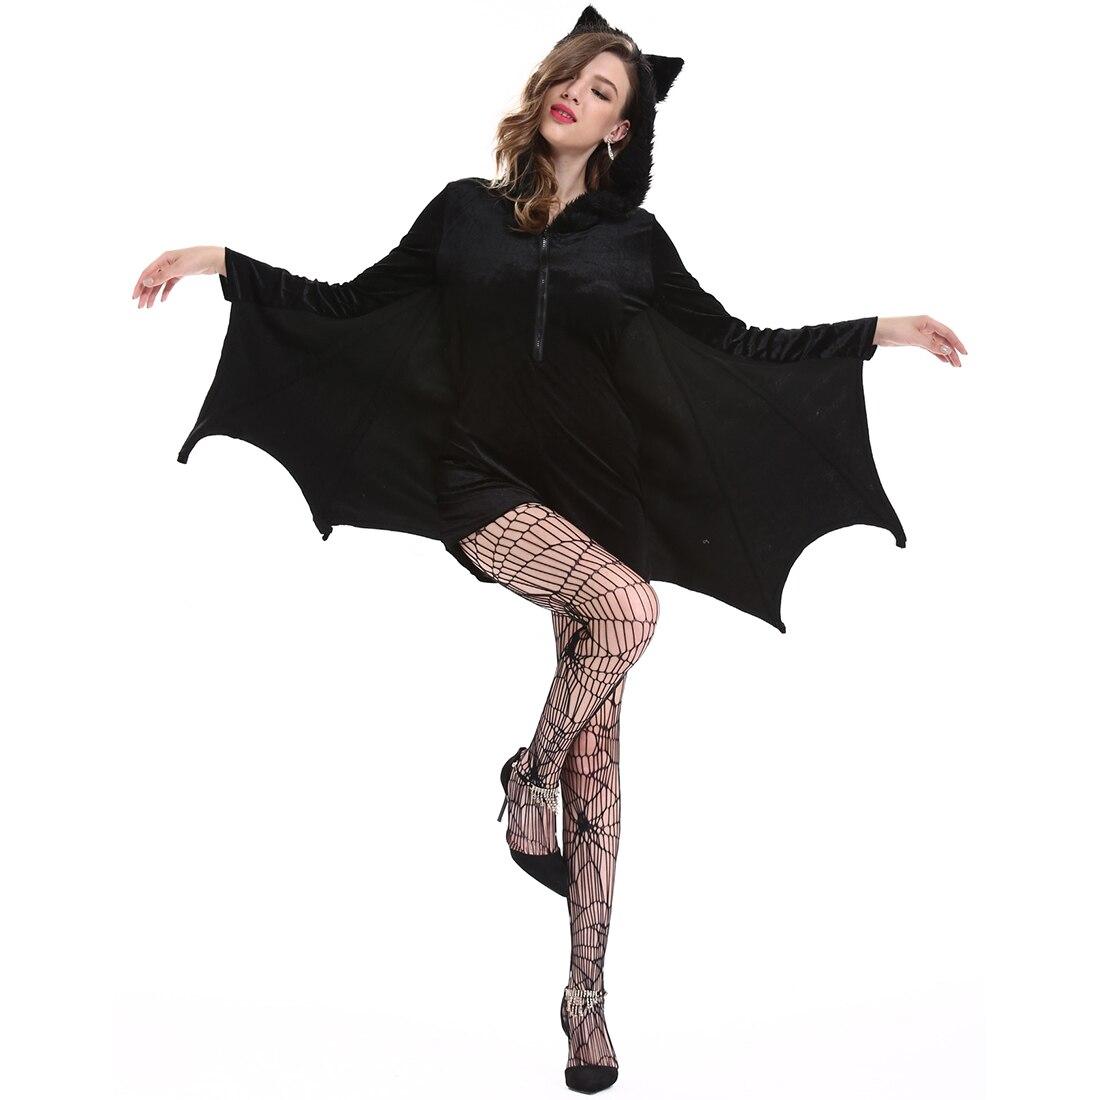 Halloween Cosplay Bat Costume Coat Creative Sexy Masquerade Vampire Uniform XXL/XL/L/M Size - Black